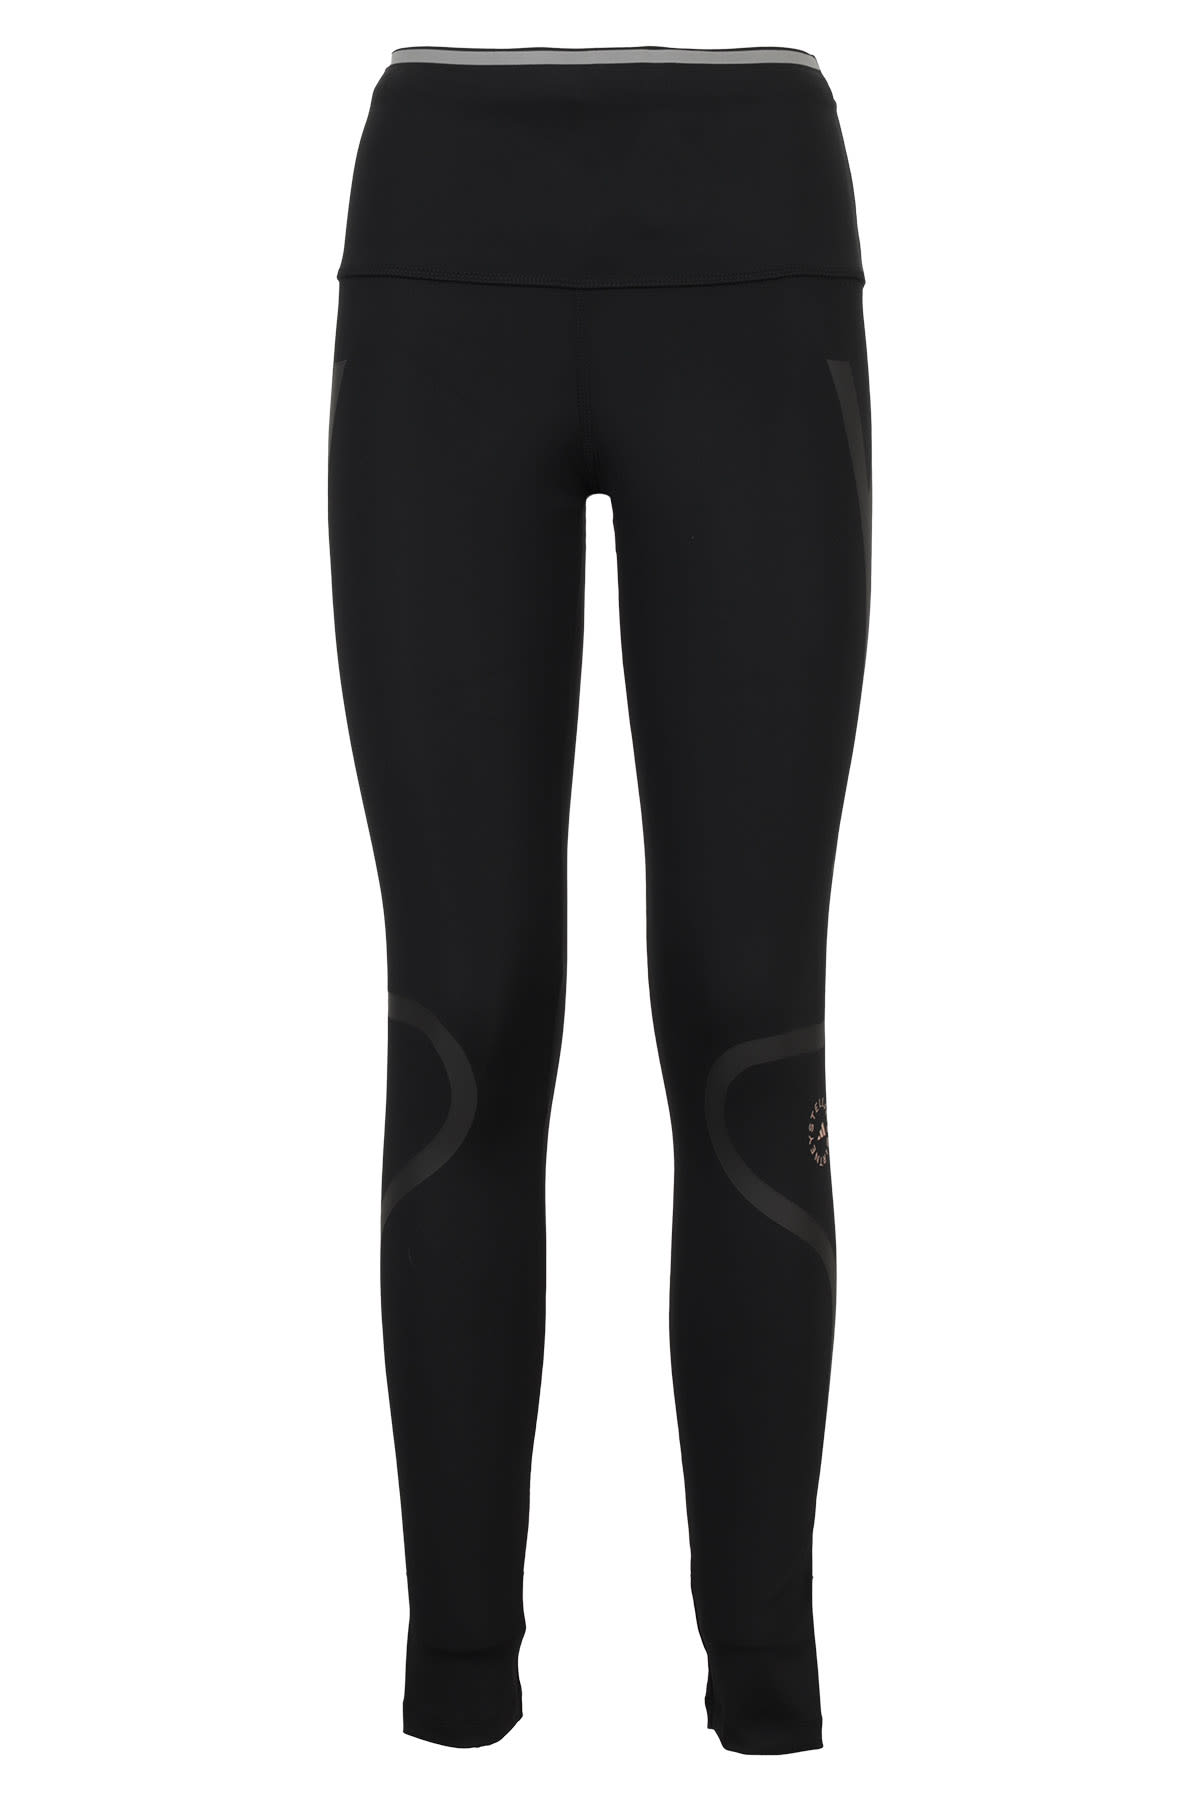 Adidas By Stella Mccartney Pants In Nero